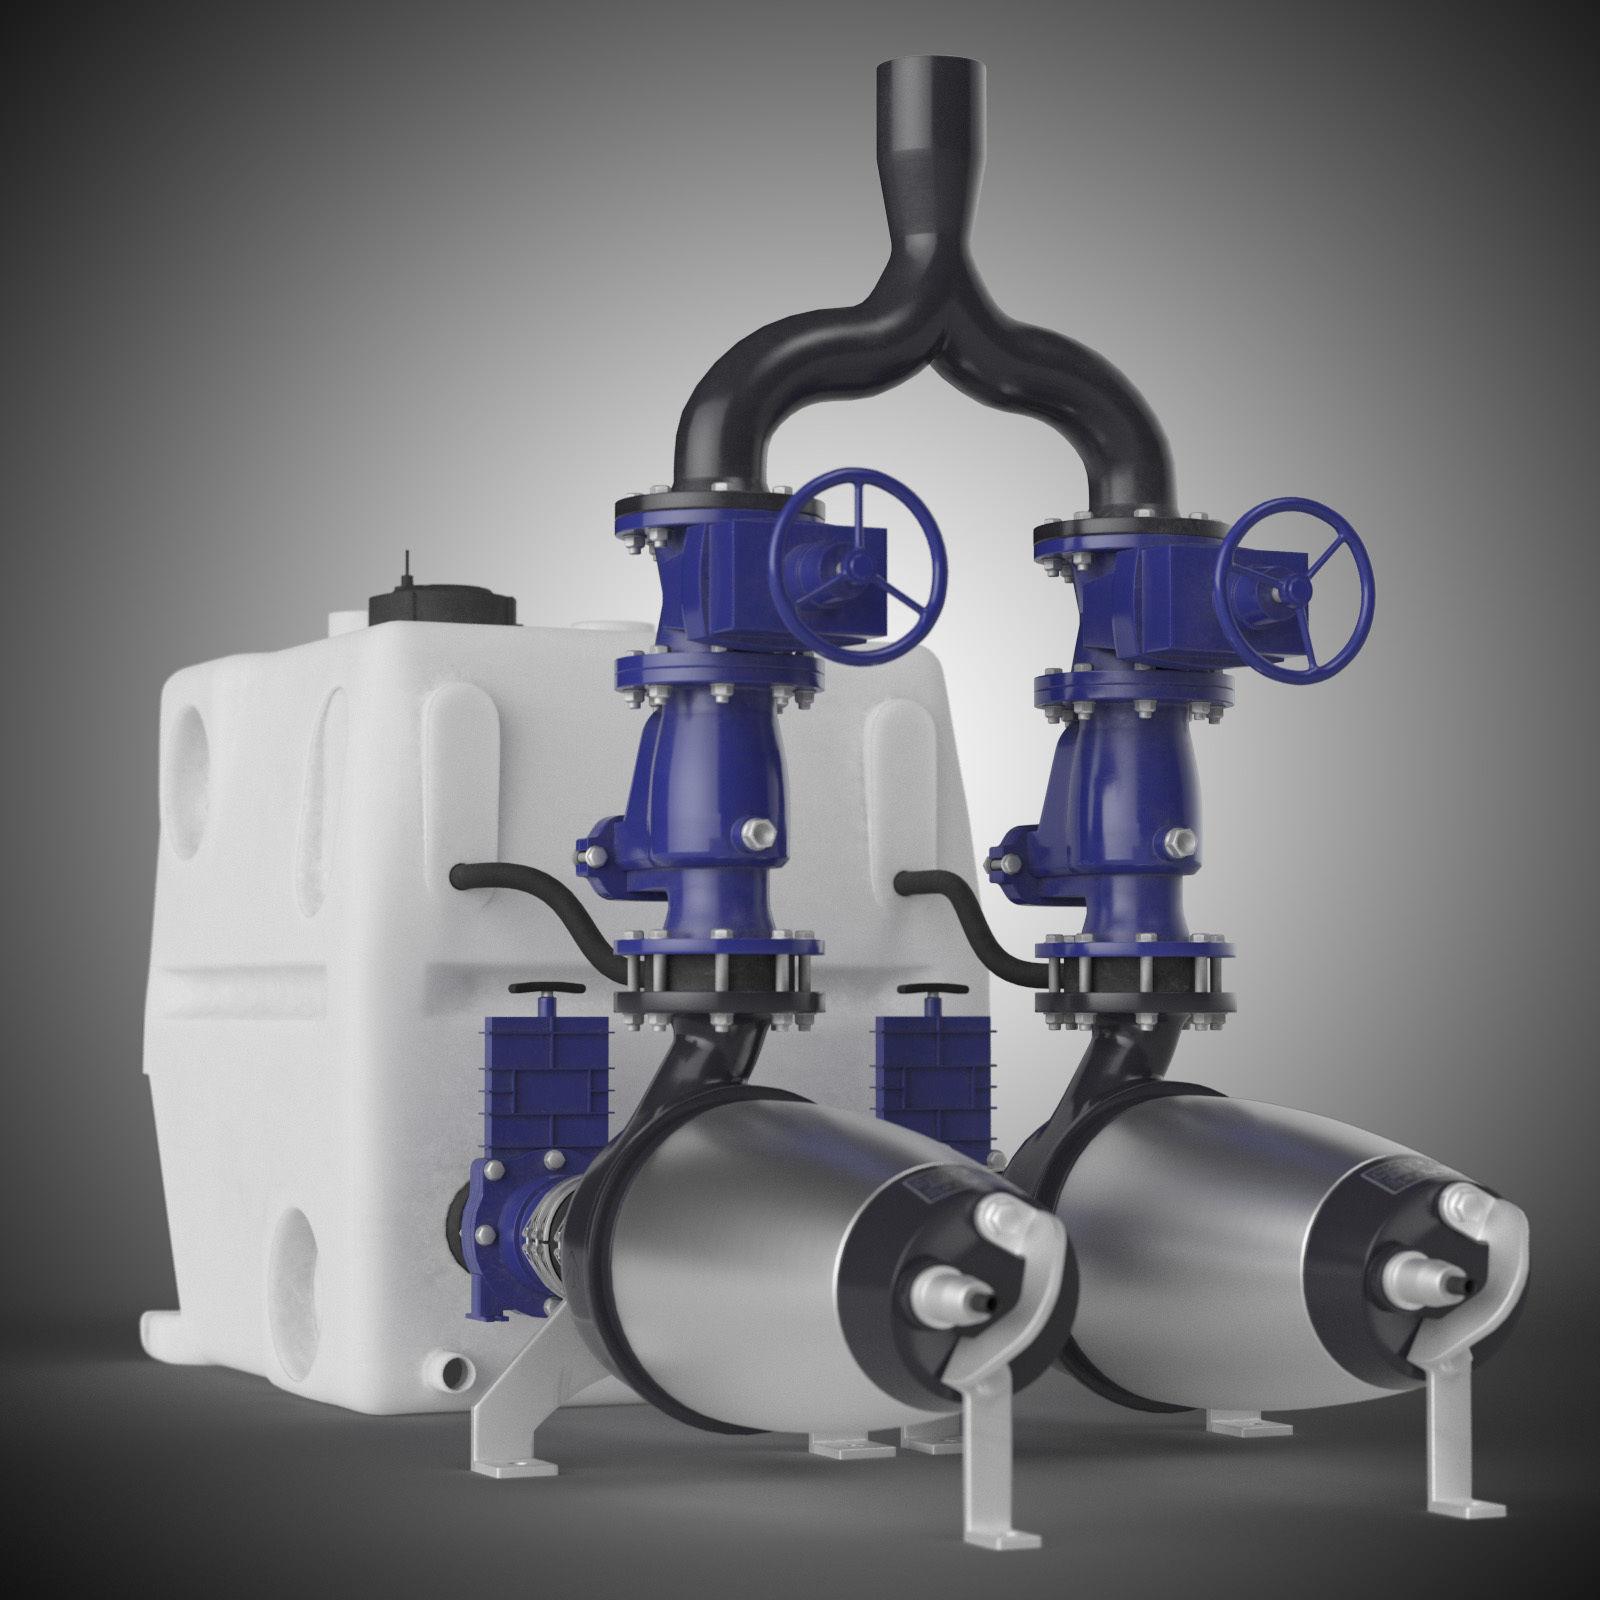 Grundfos multilift MDV pump with tank